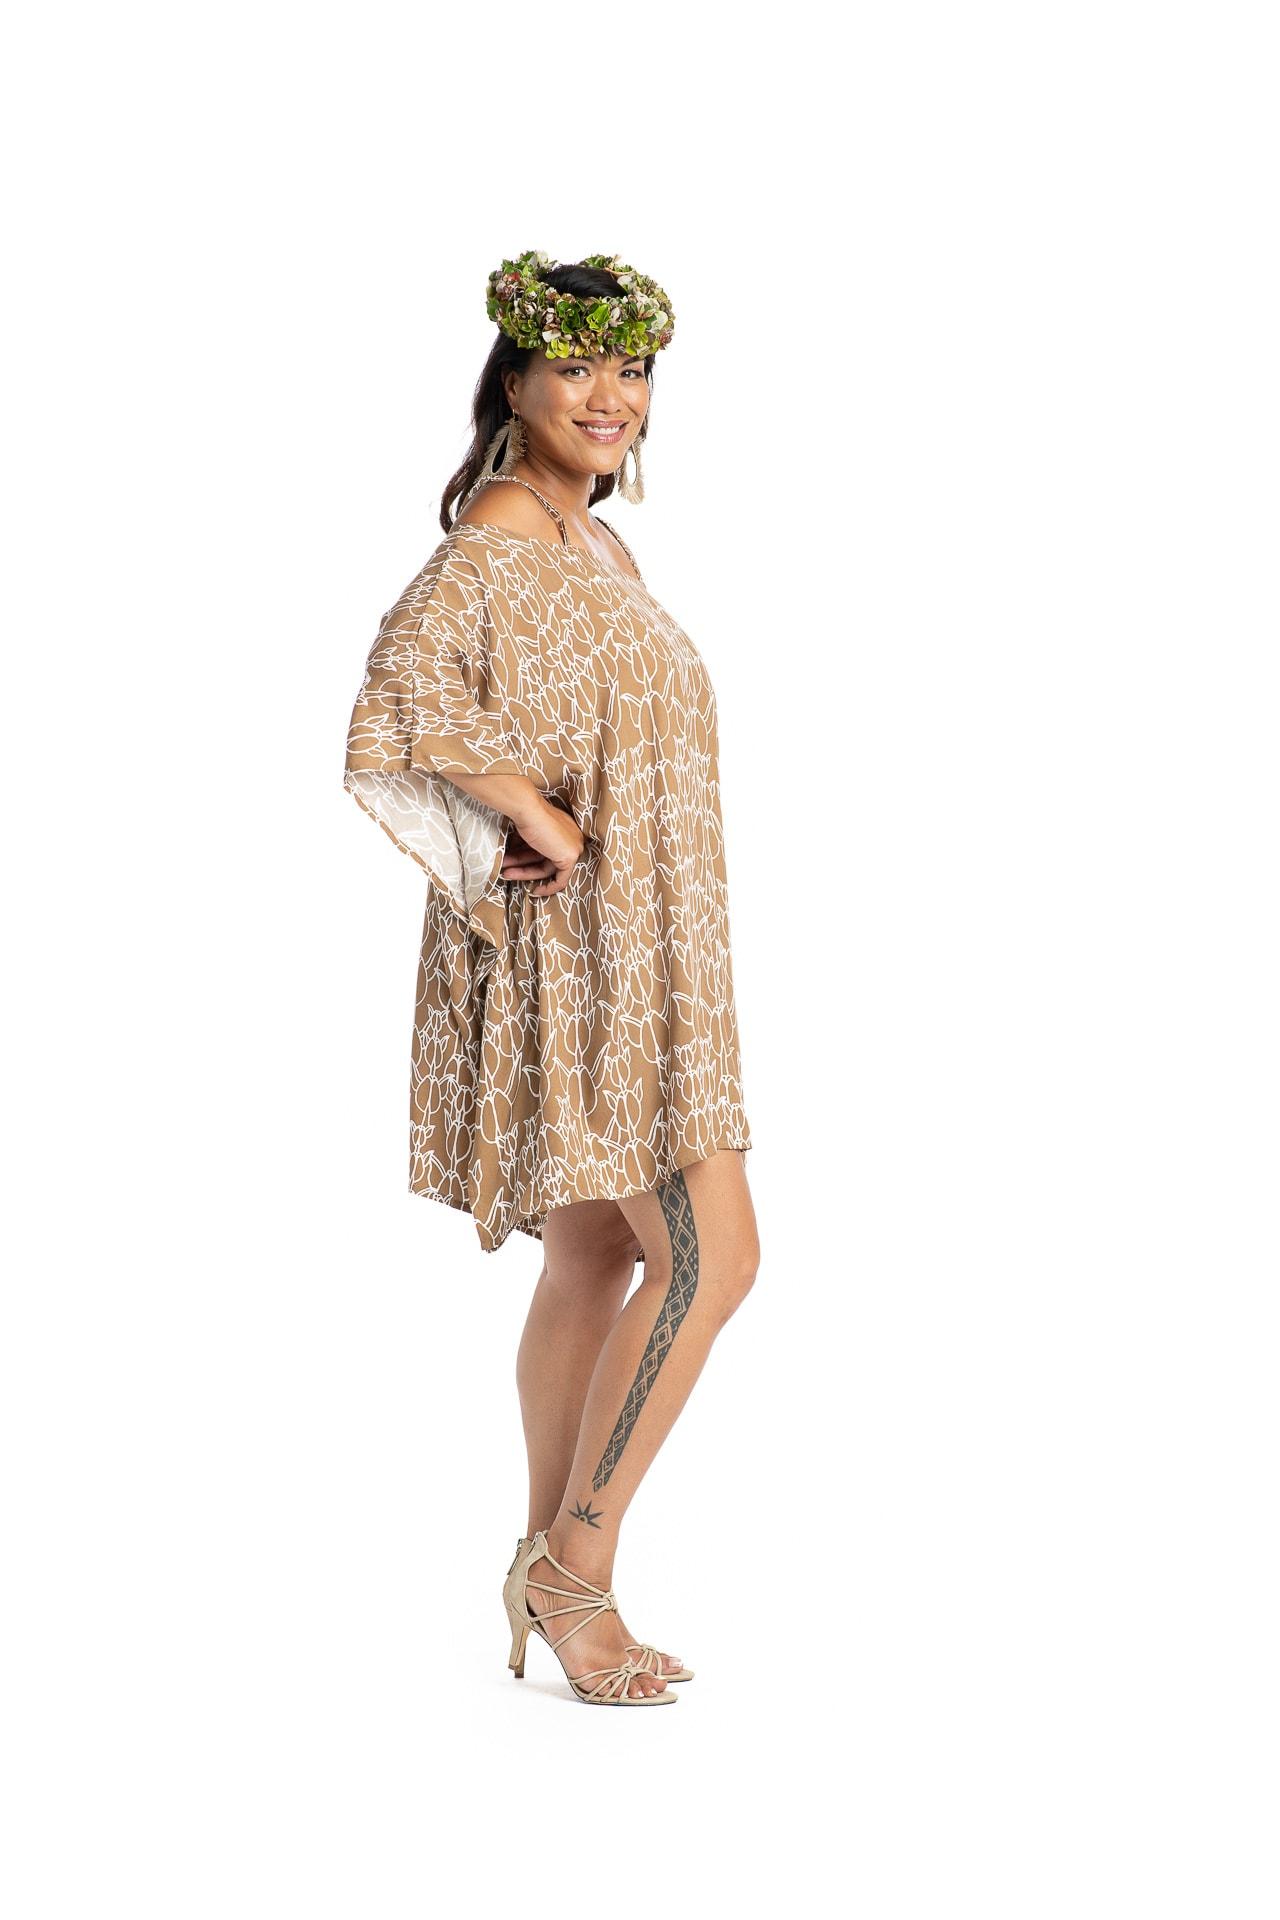 Model wearing Malama Top - Side View